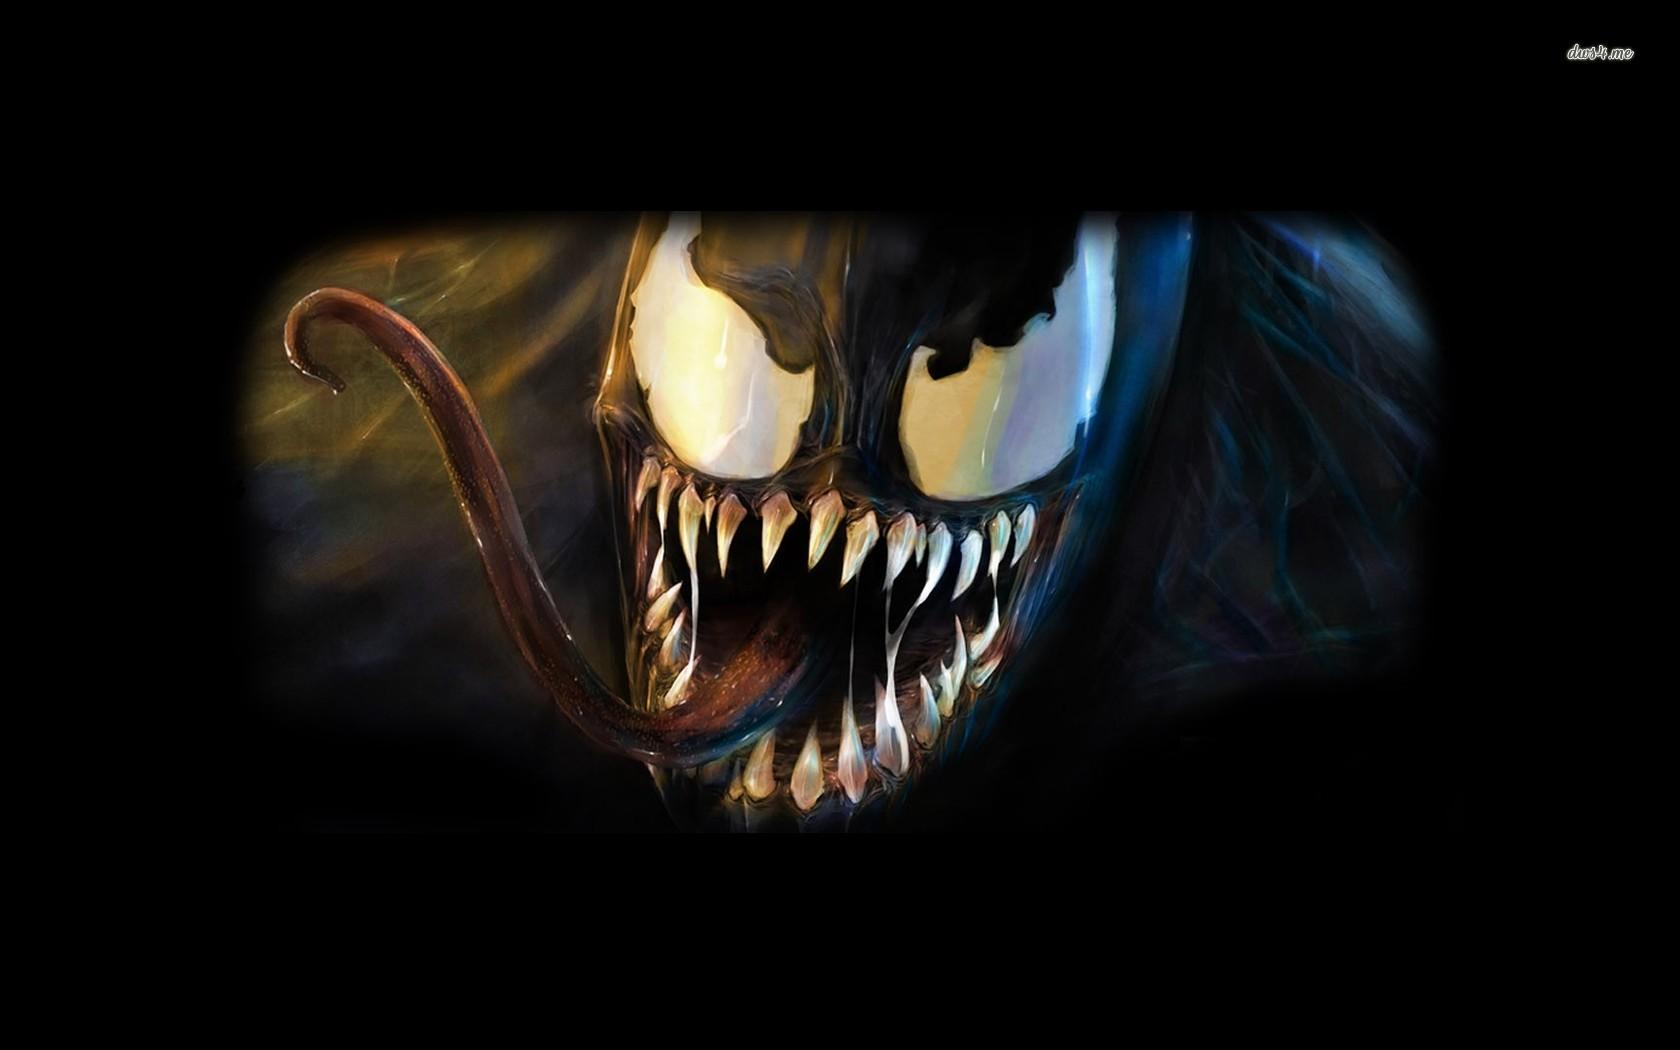 Venom Marvel Ultimate Alliance Game Wallpaper 1680x1050 pixel 1680x1050